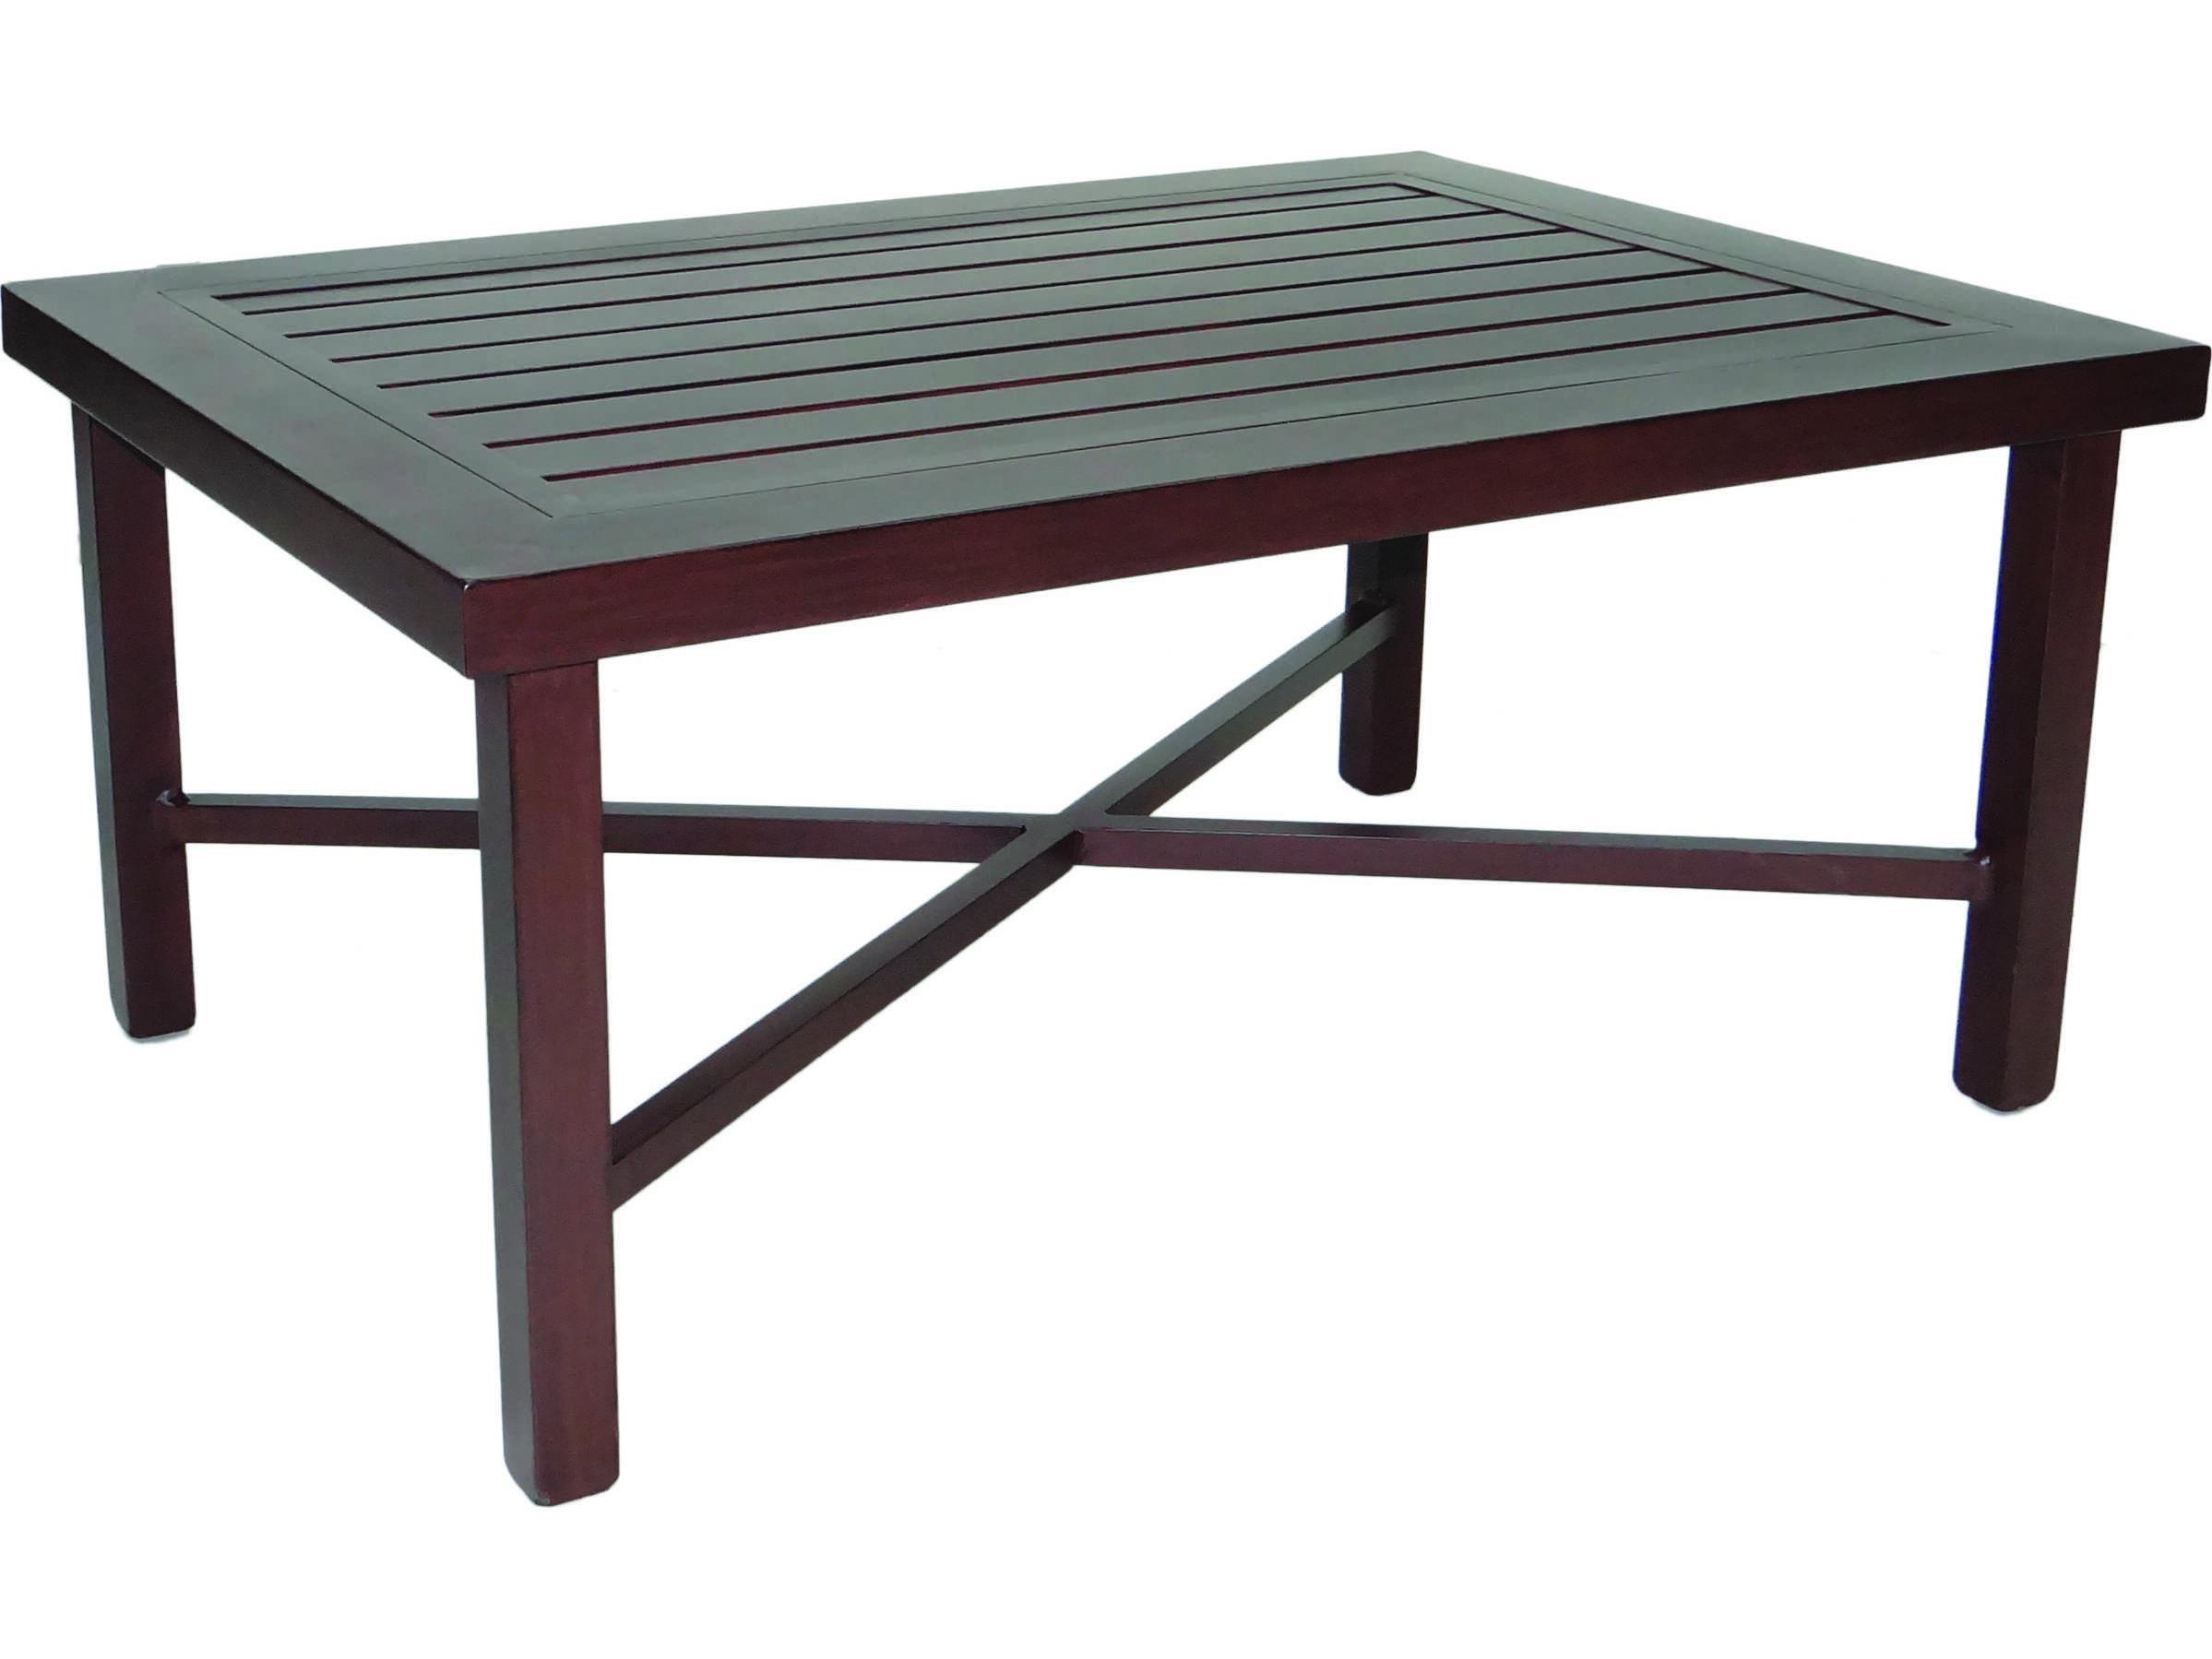 Castelle Contempo Cast Aluminum 42 X 30 Rectangular Coffee Table Ready To Assemble Prc3042e